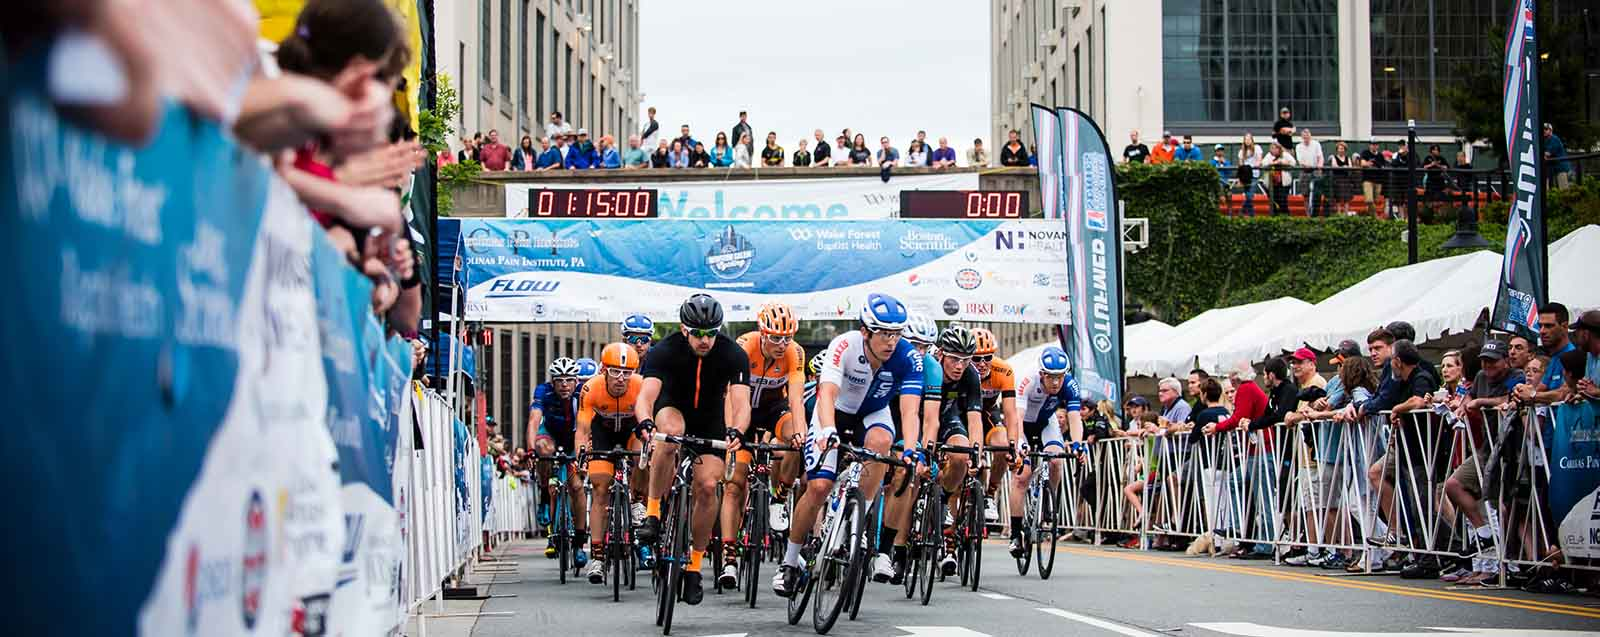 North Carolina Sports Association Cycling in Winston Salem